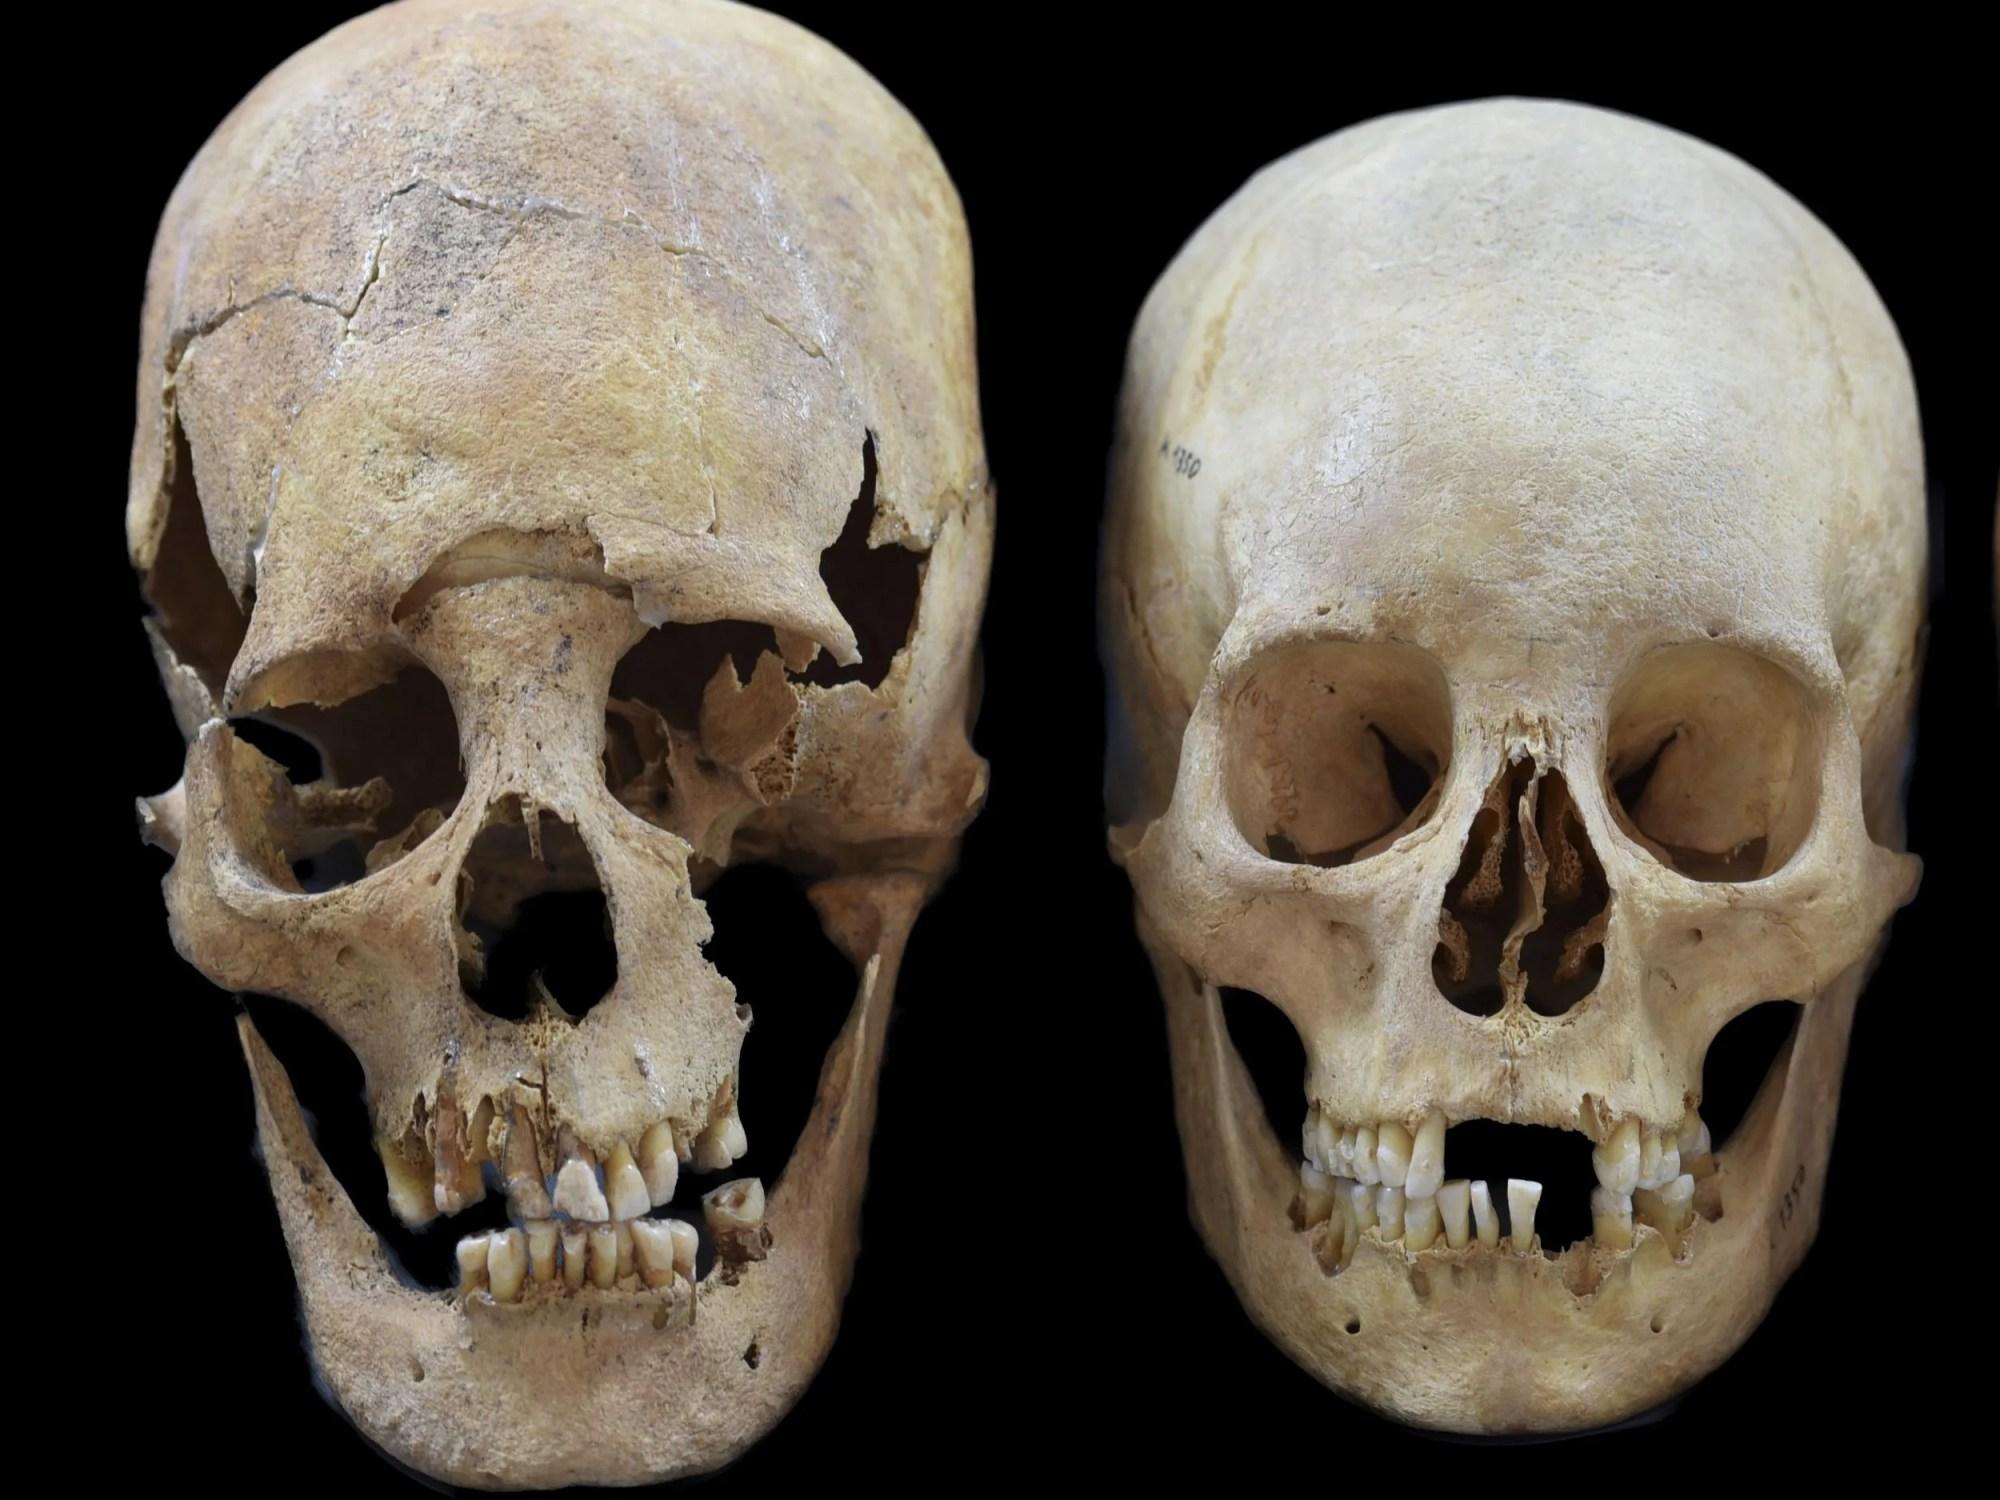 hight resolution of deformed skulls from dark age site show women were pioneers of europe not just men